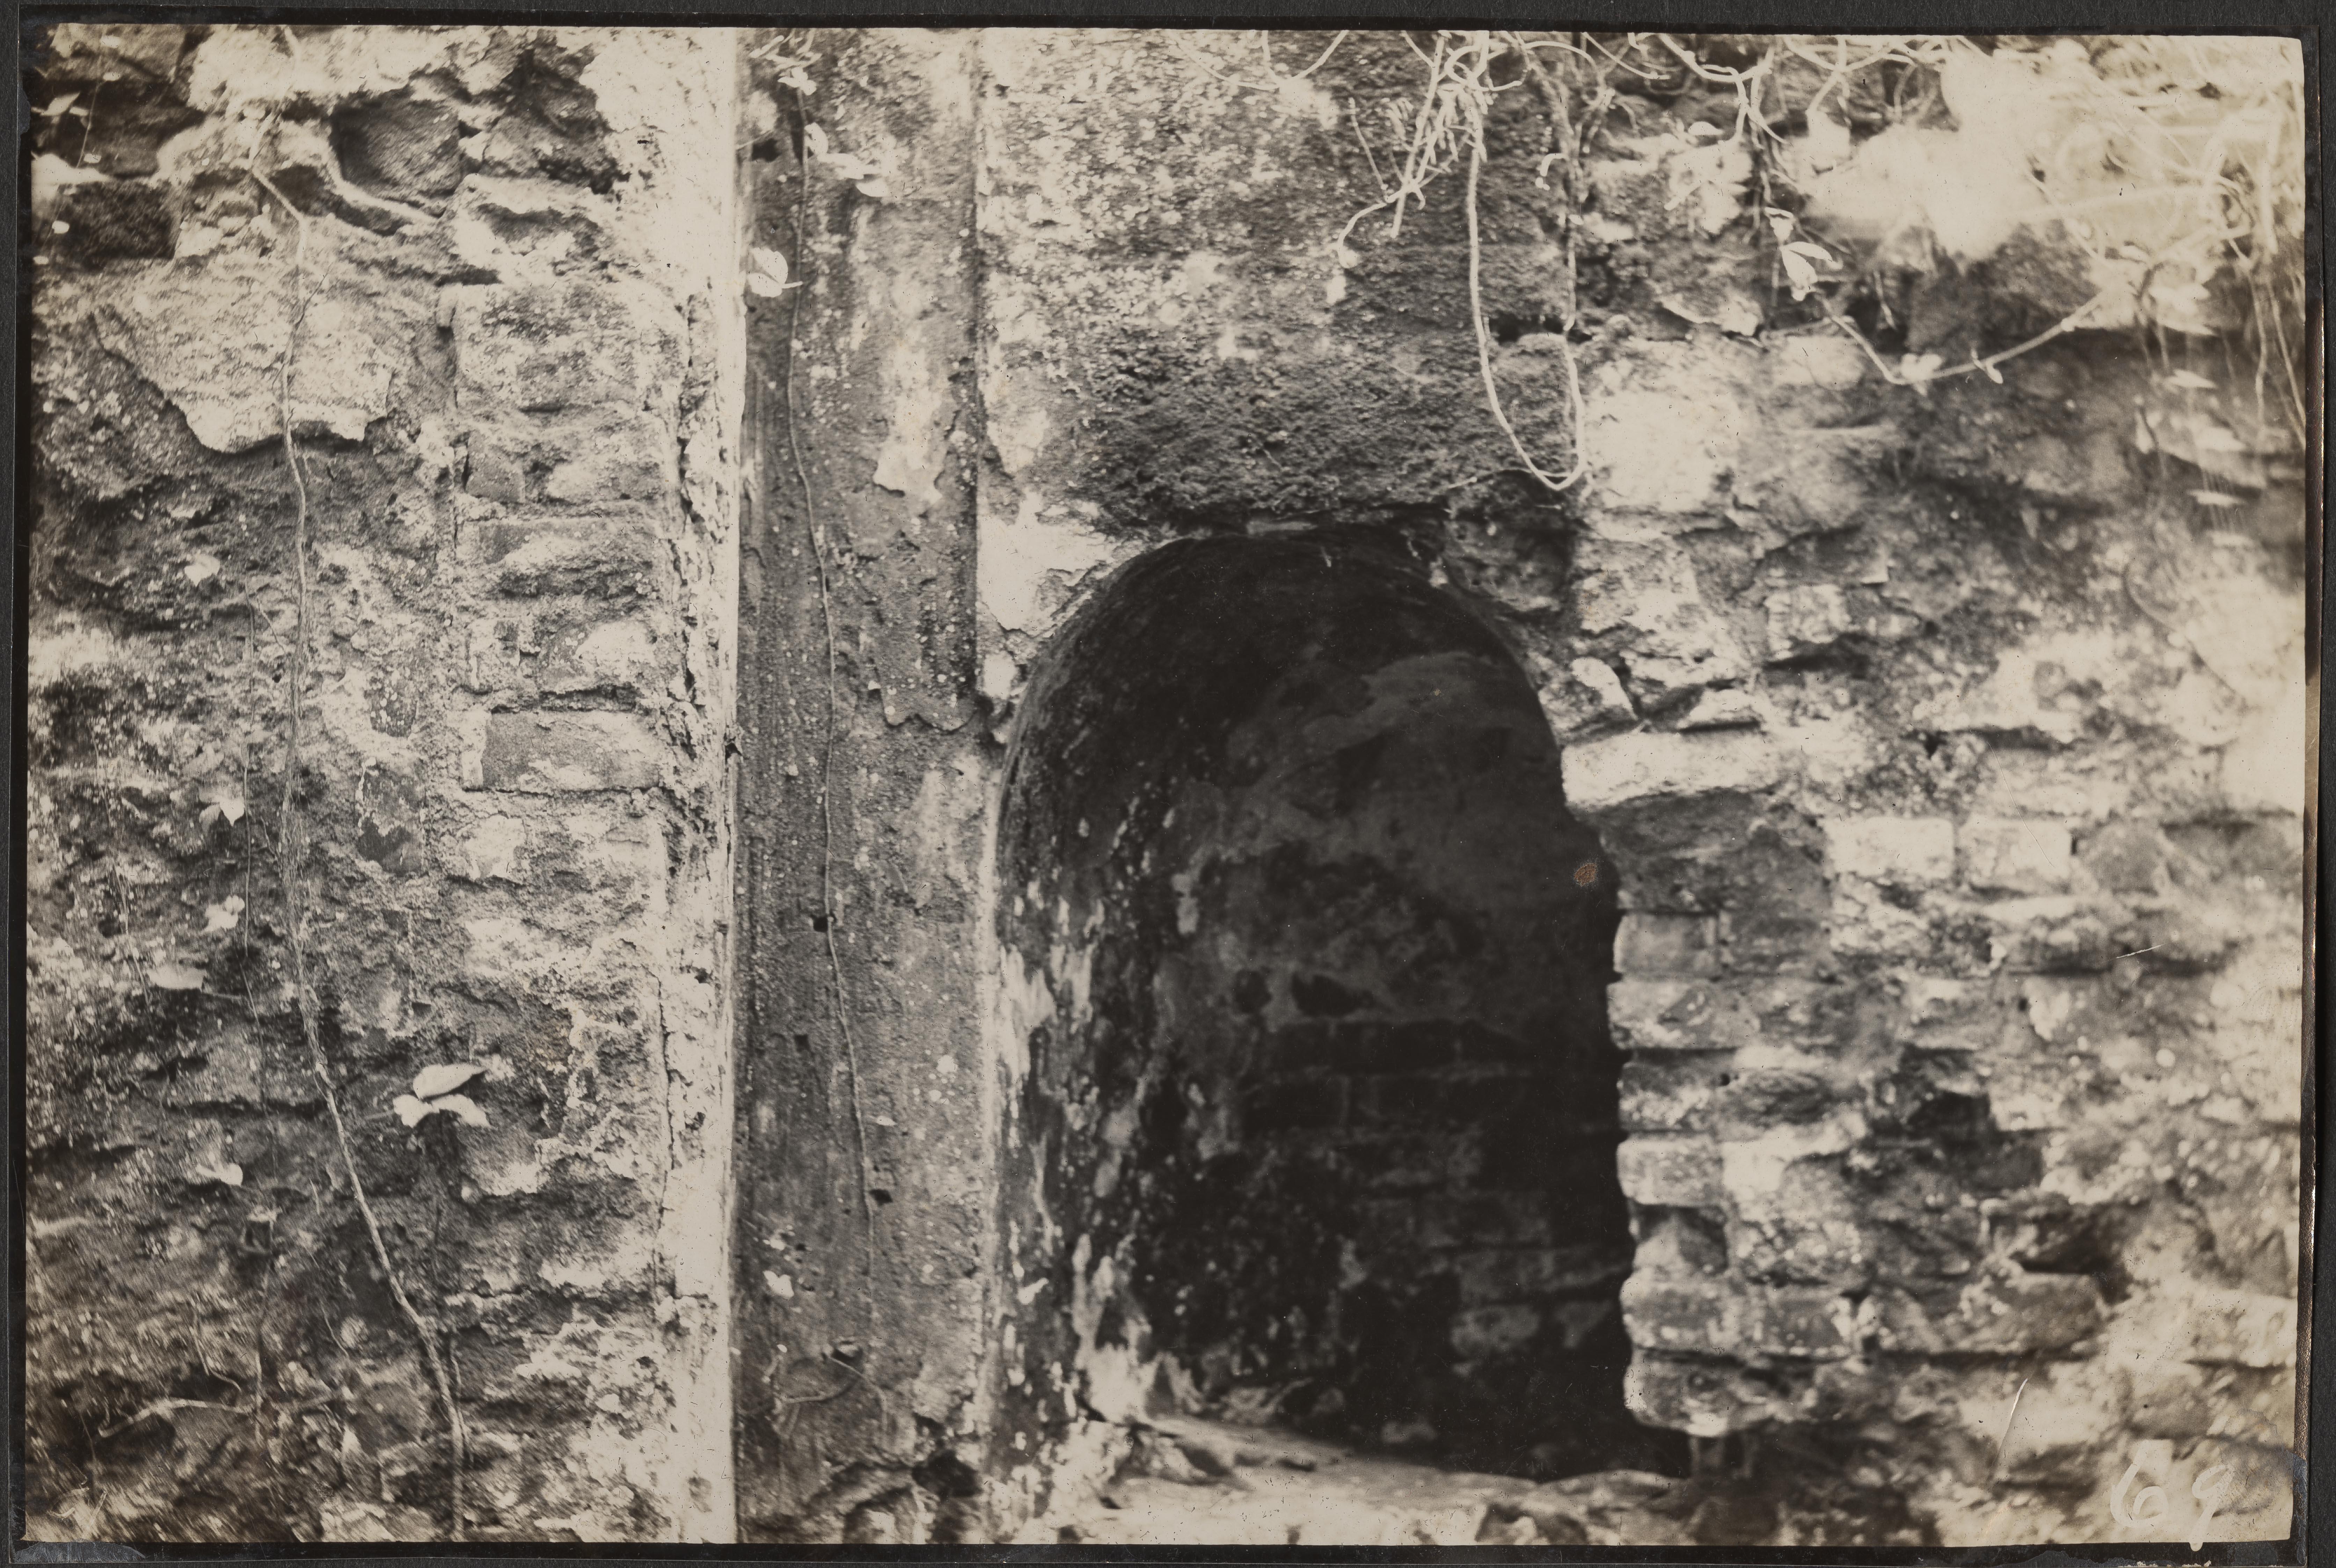 Santee-Cooper Cemetery Investigation 019